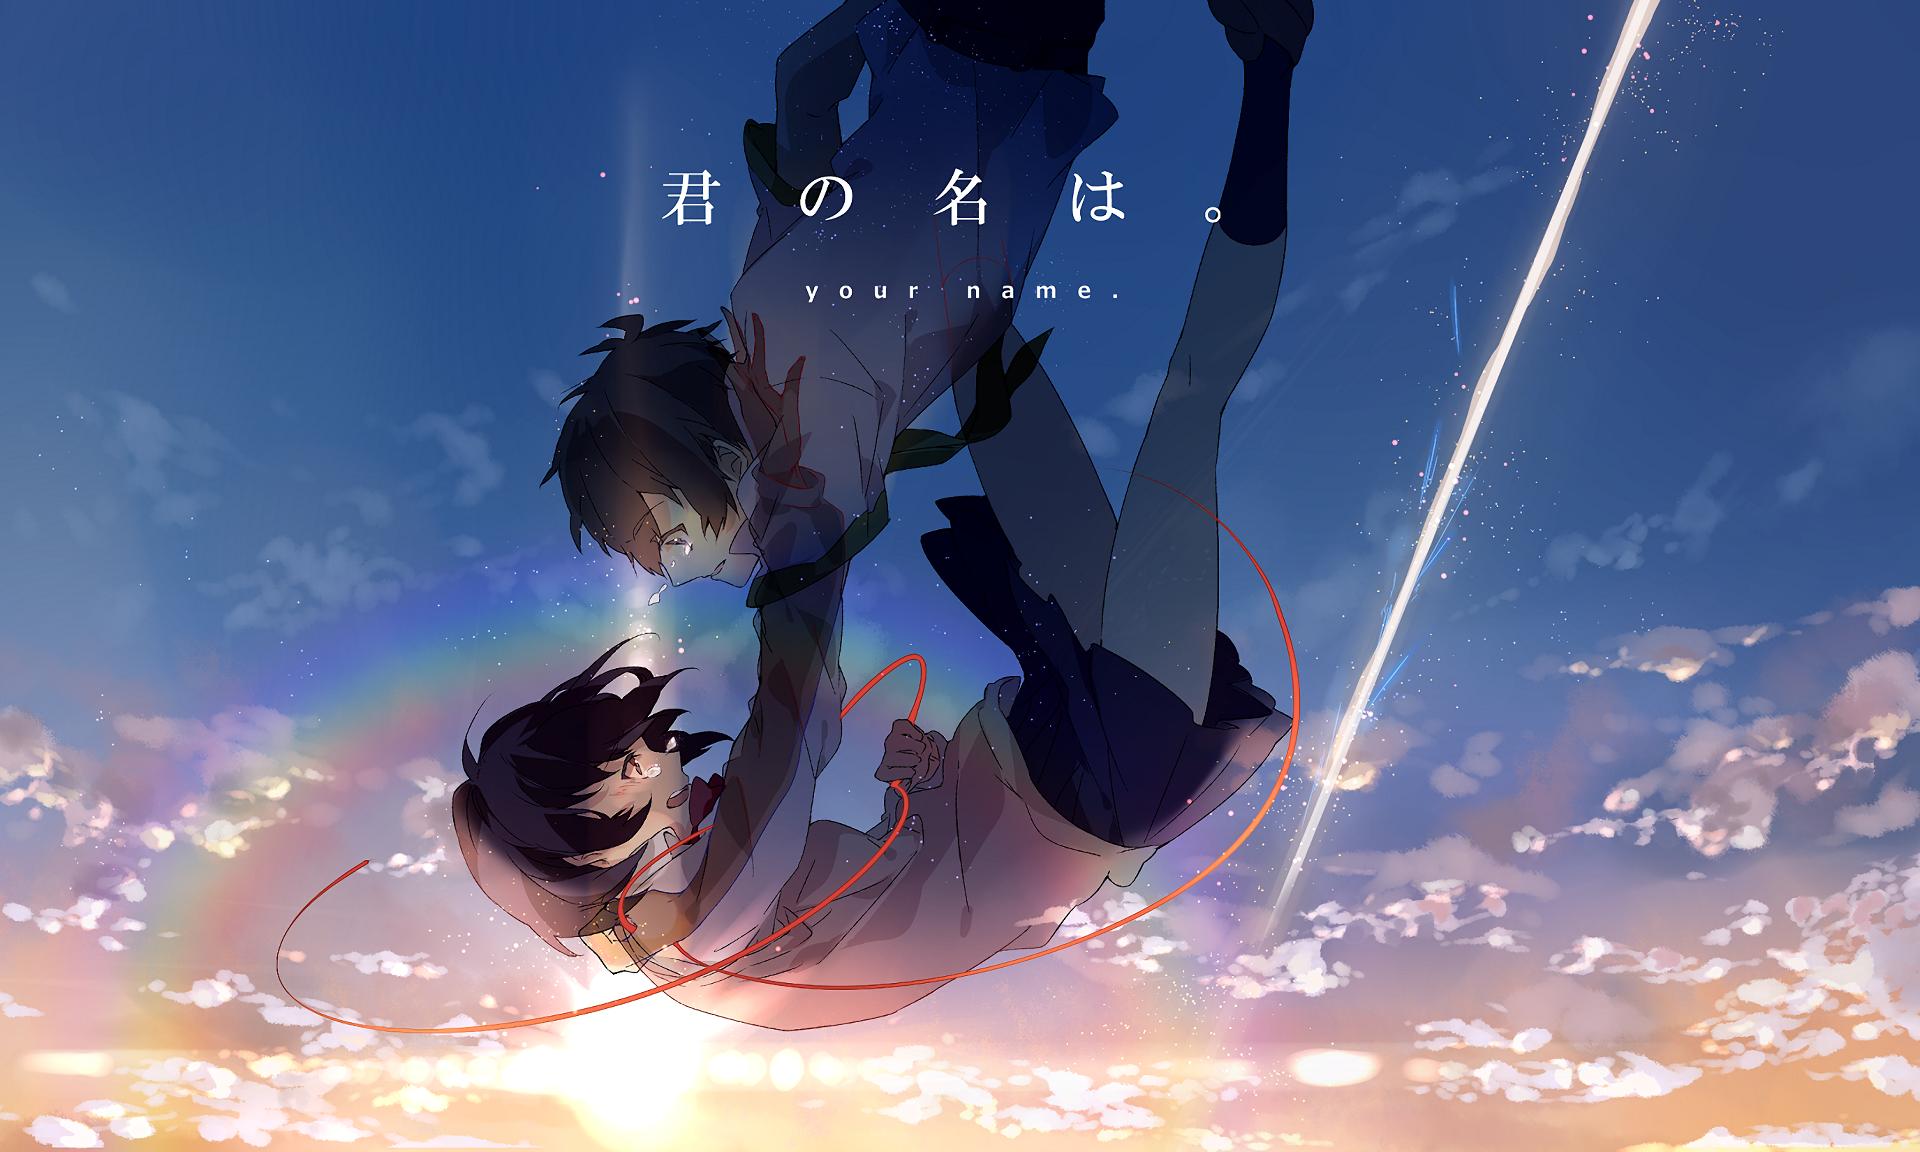 Anime Your Name Kimi No Na Wa Mitsuha Miyamizu Taki Tachibana Fond D Ecran Kimi No Na Wa Film Animation Japonais Animation Japonaise